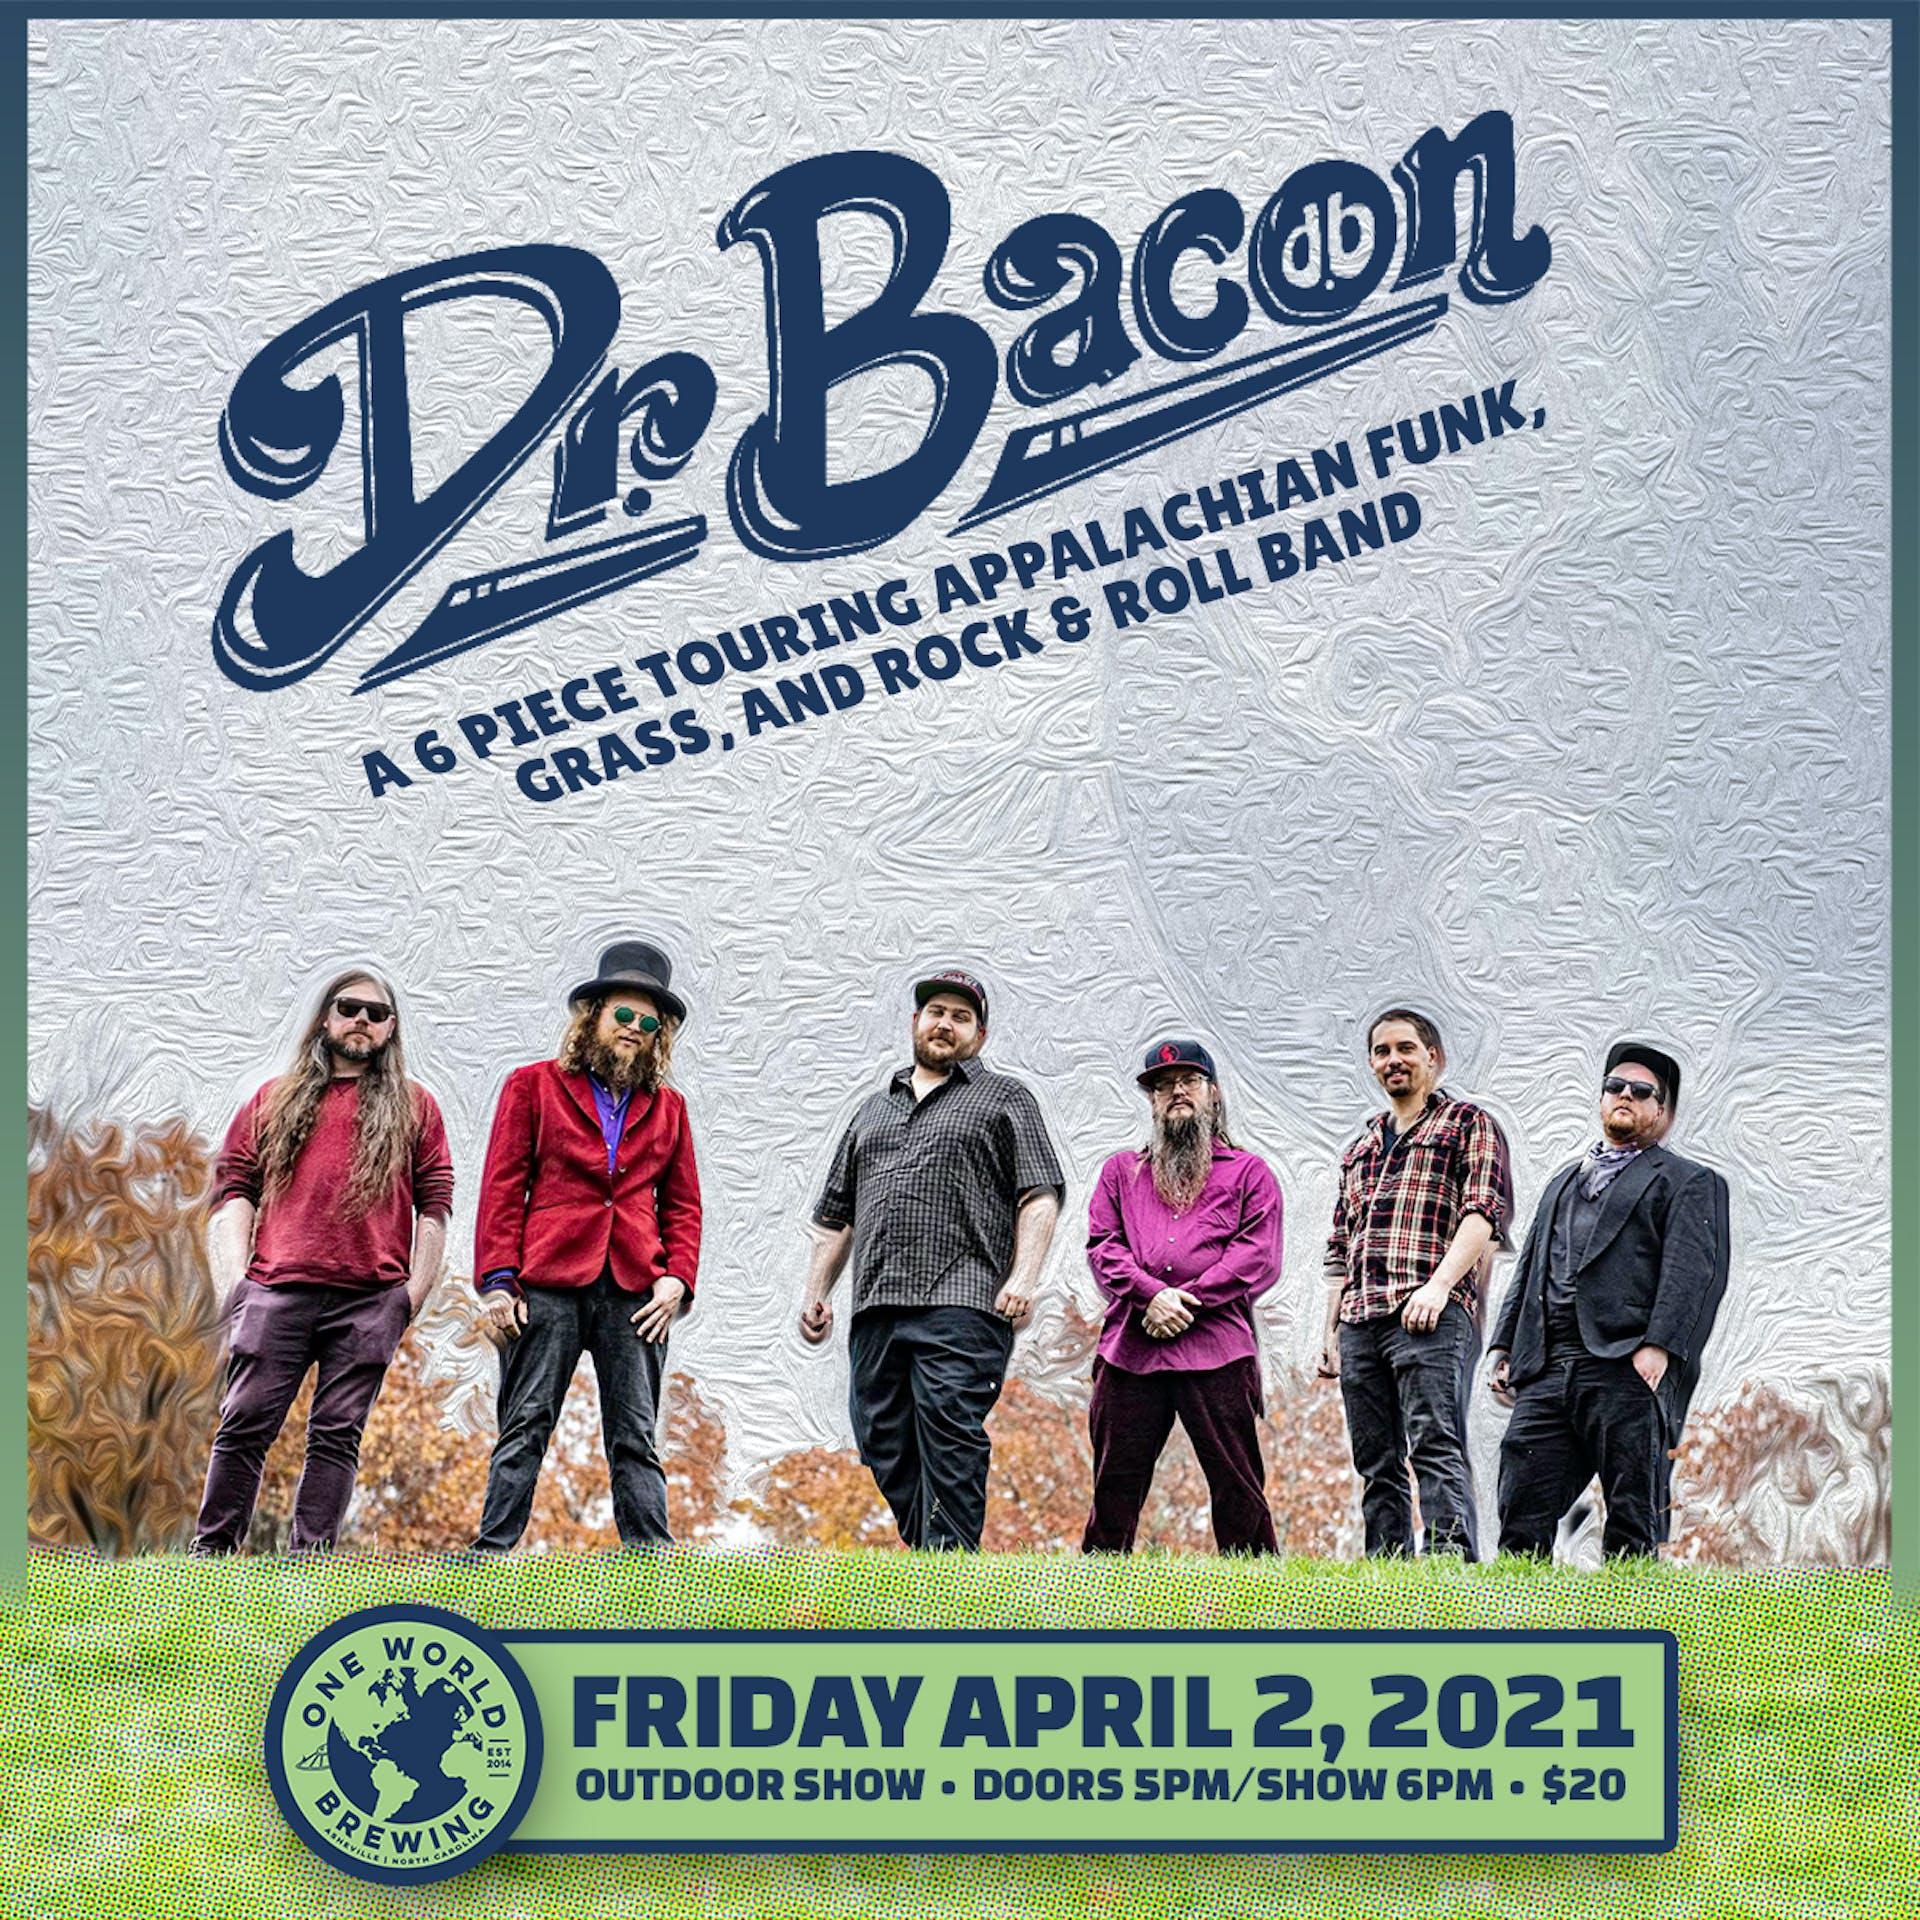 2021-04-02 - DrBacon_OWB - IG Square